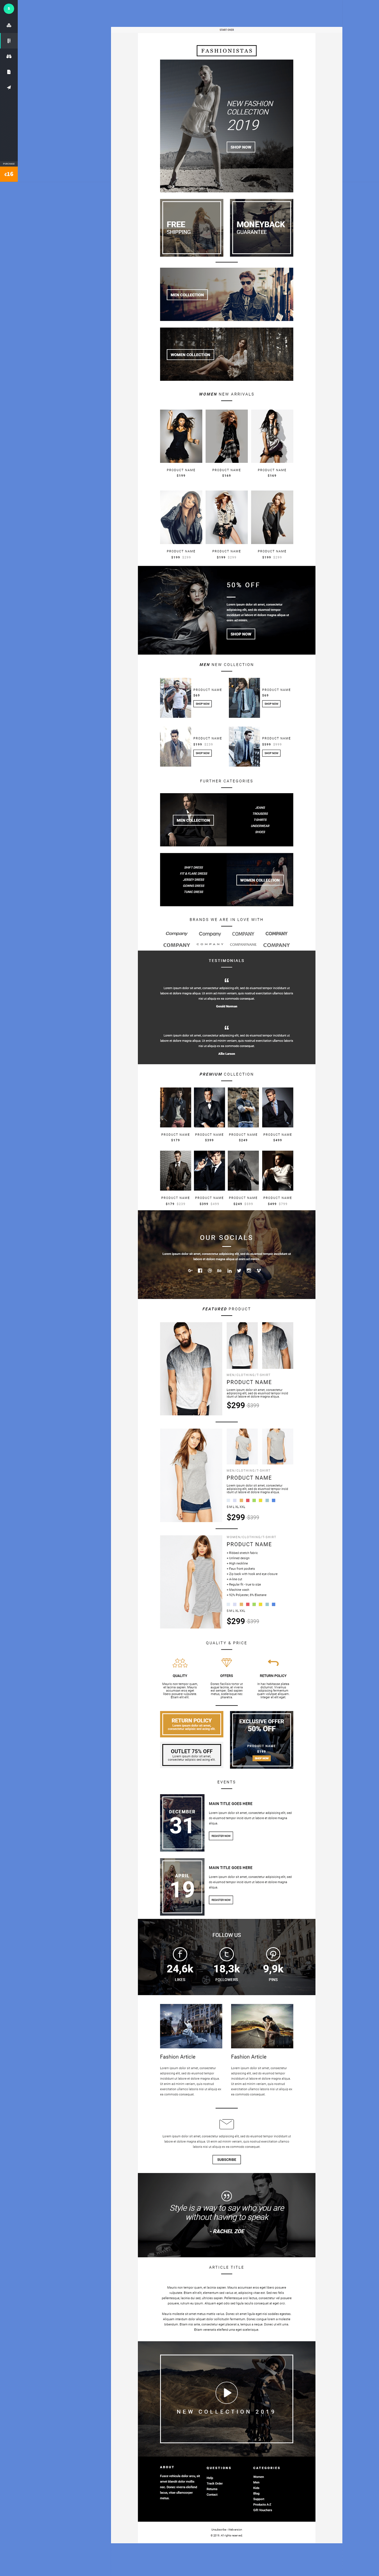 Image may contain: screenshot, clothing and person